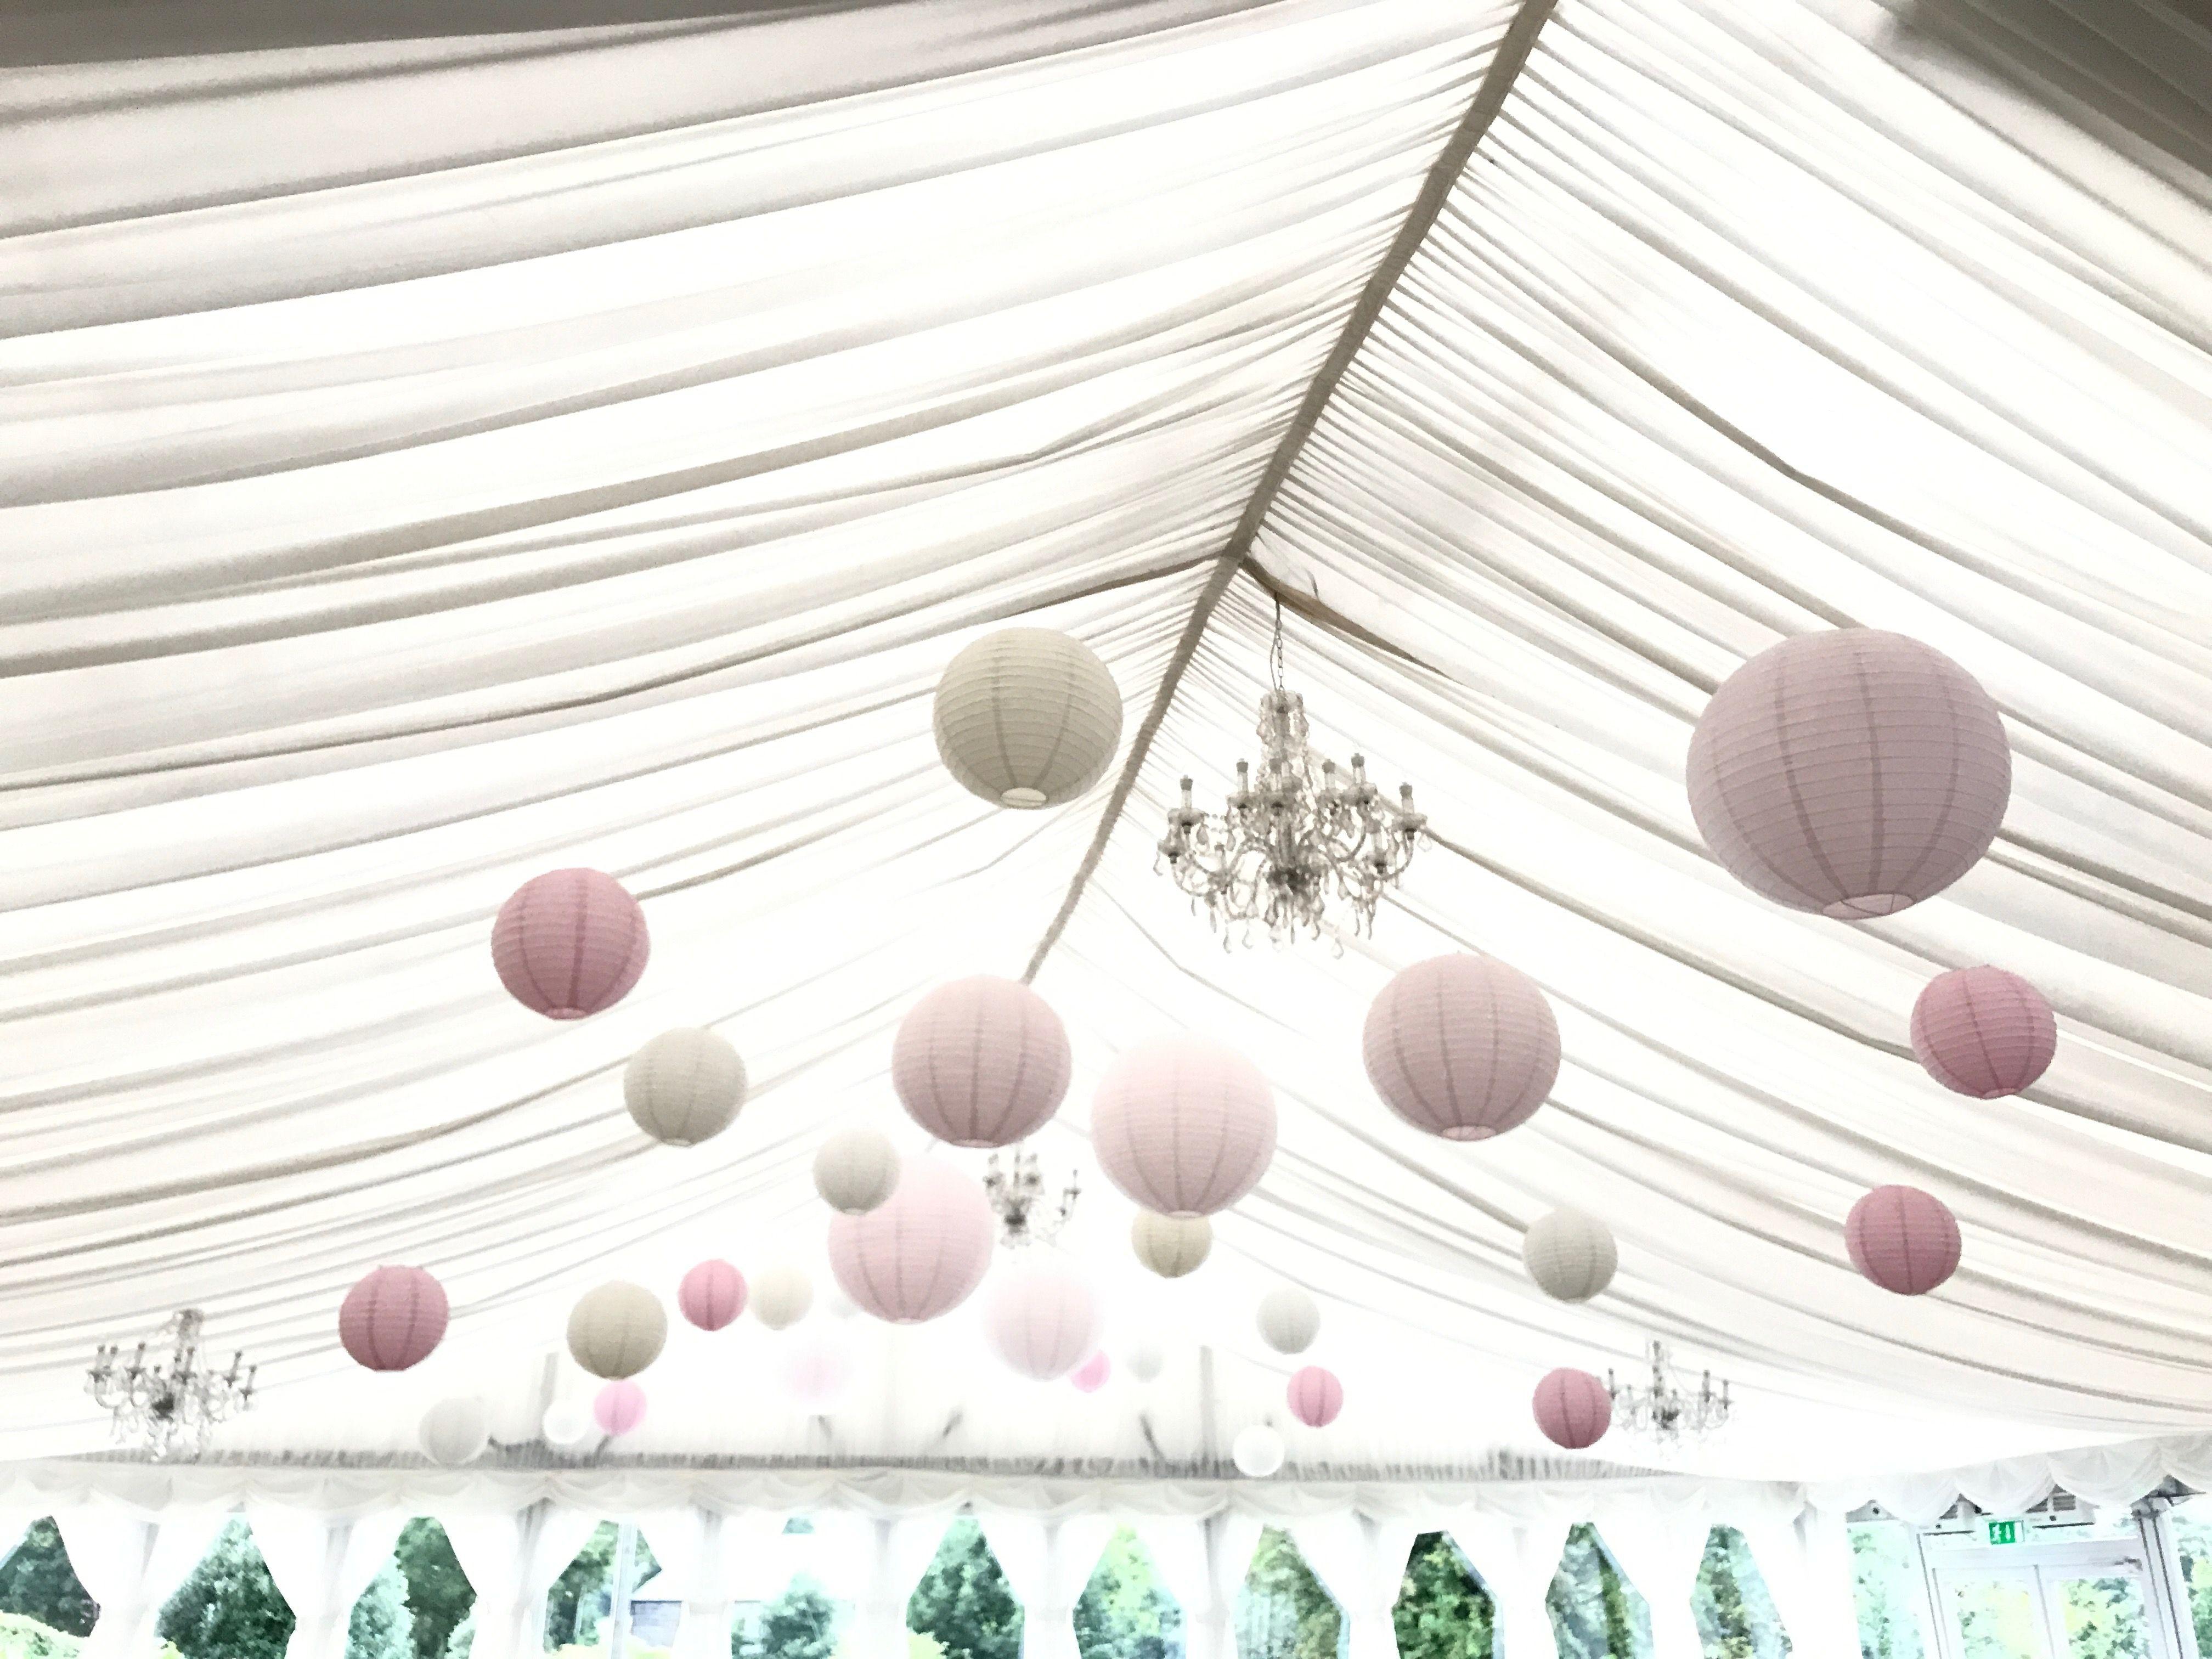 40 cream, lace, soft pink paper lanterns